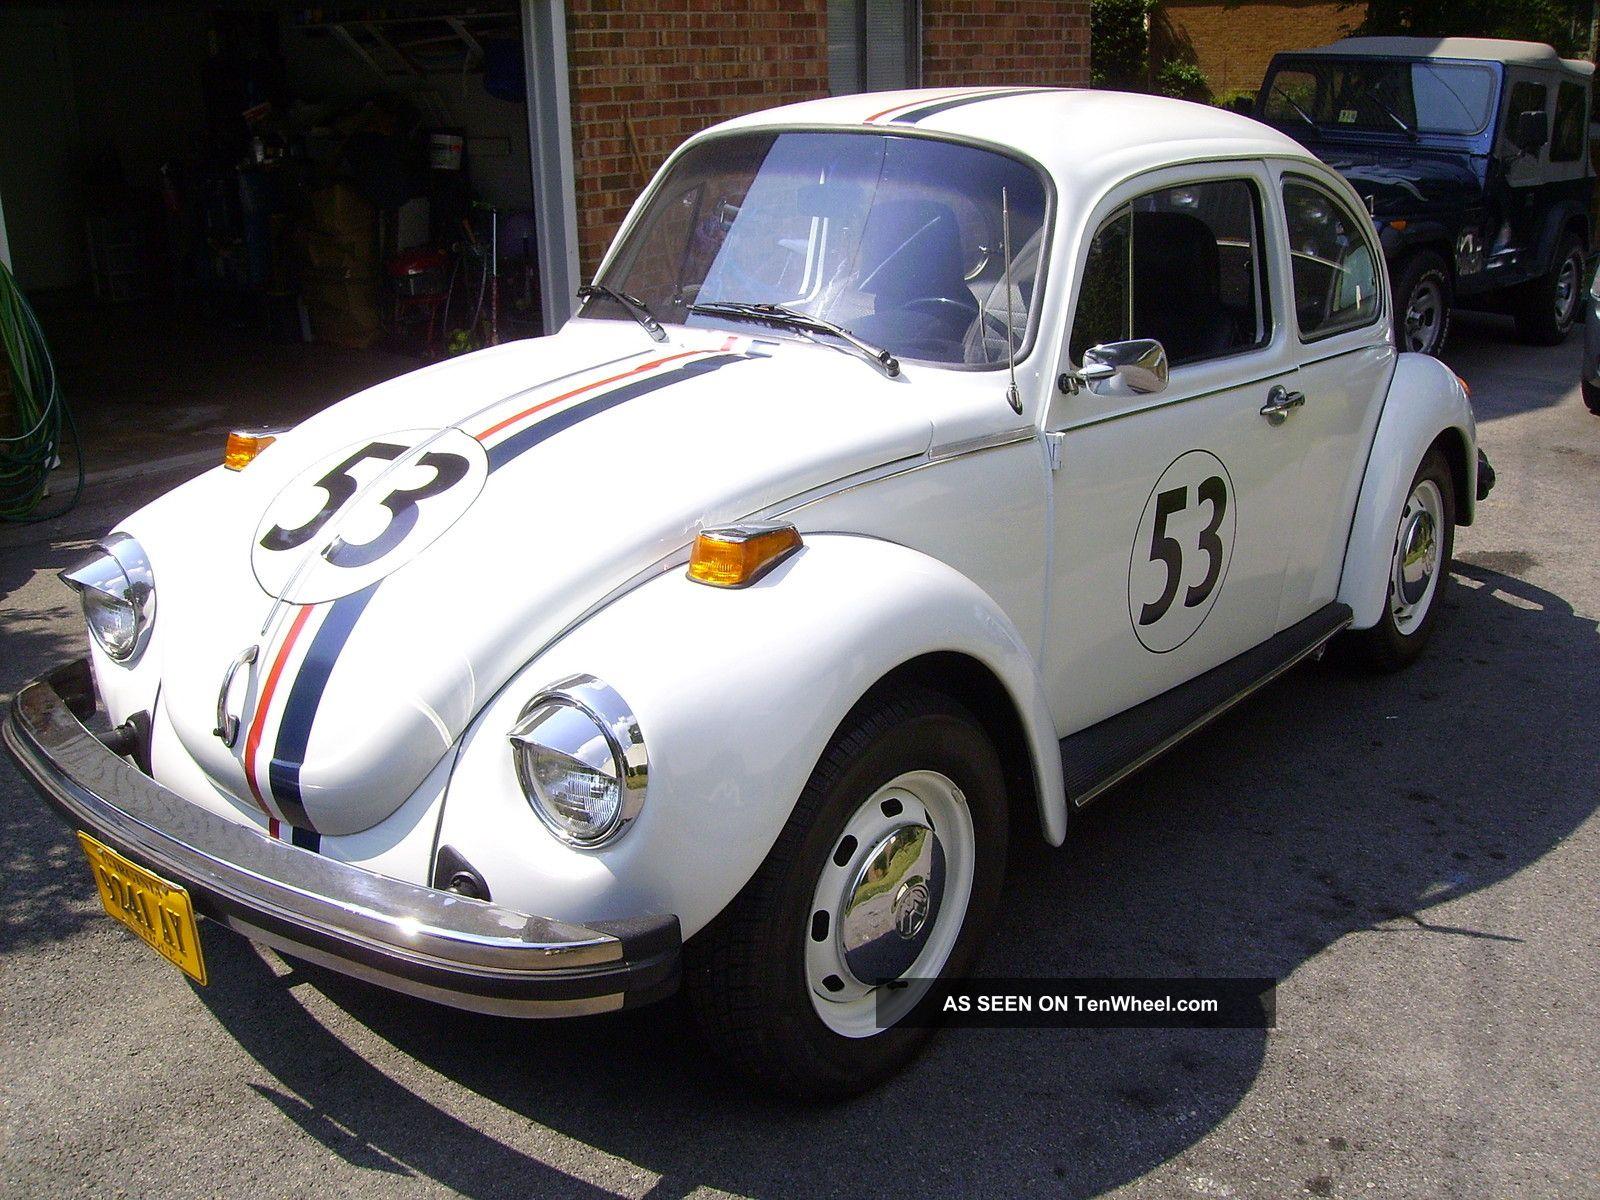 2015 f650 wiring diagram 1998 chevy tahoe vw super beetle subaru engine, vw, free engine image for user manual download